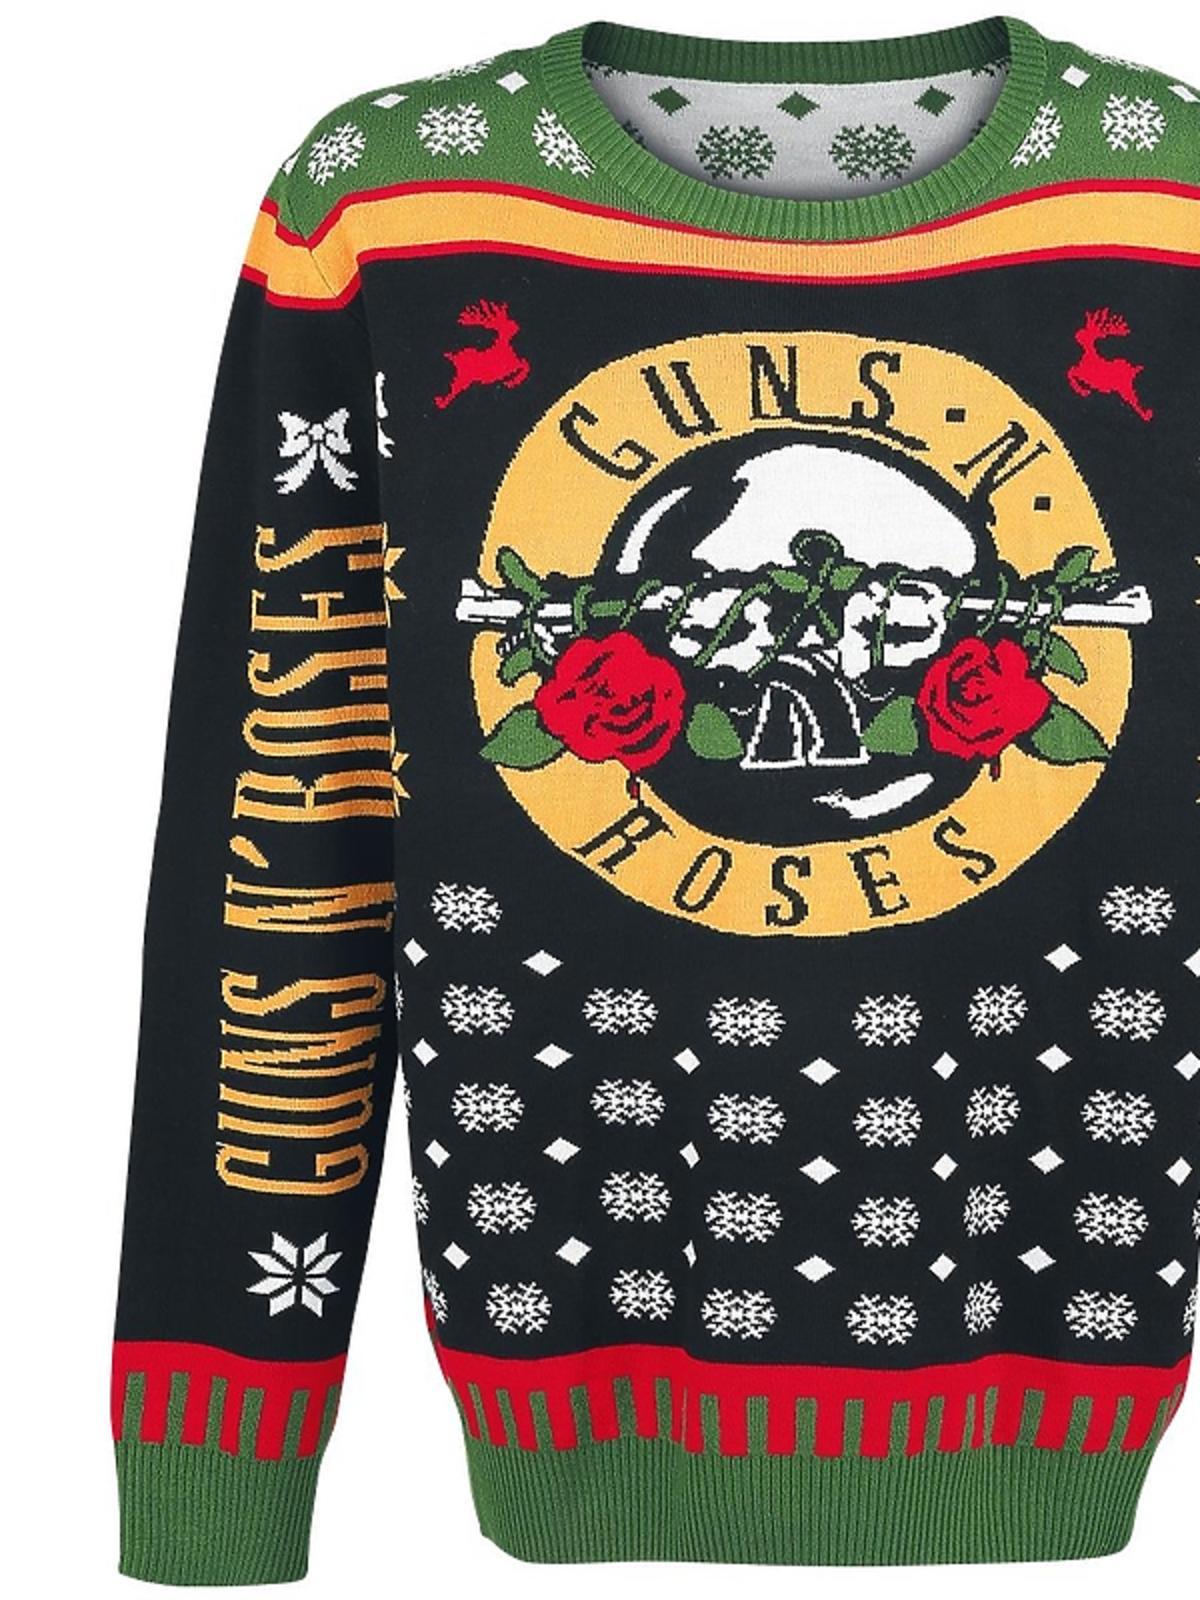 Świąteczny sweter Guns N' Roses, Emp-shop.pl